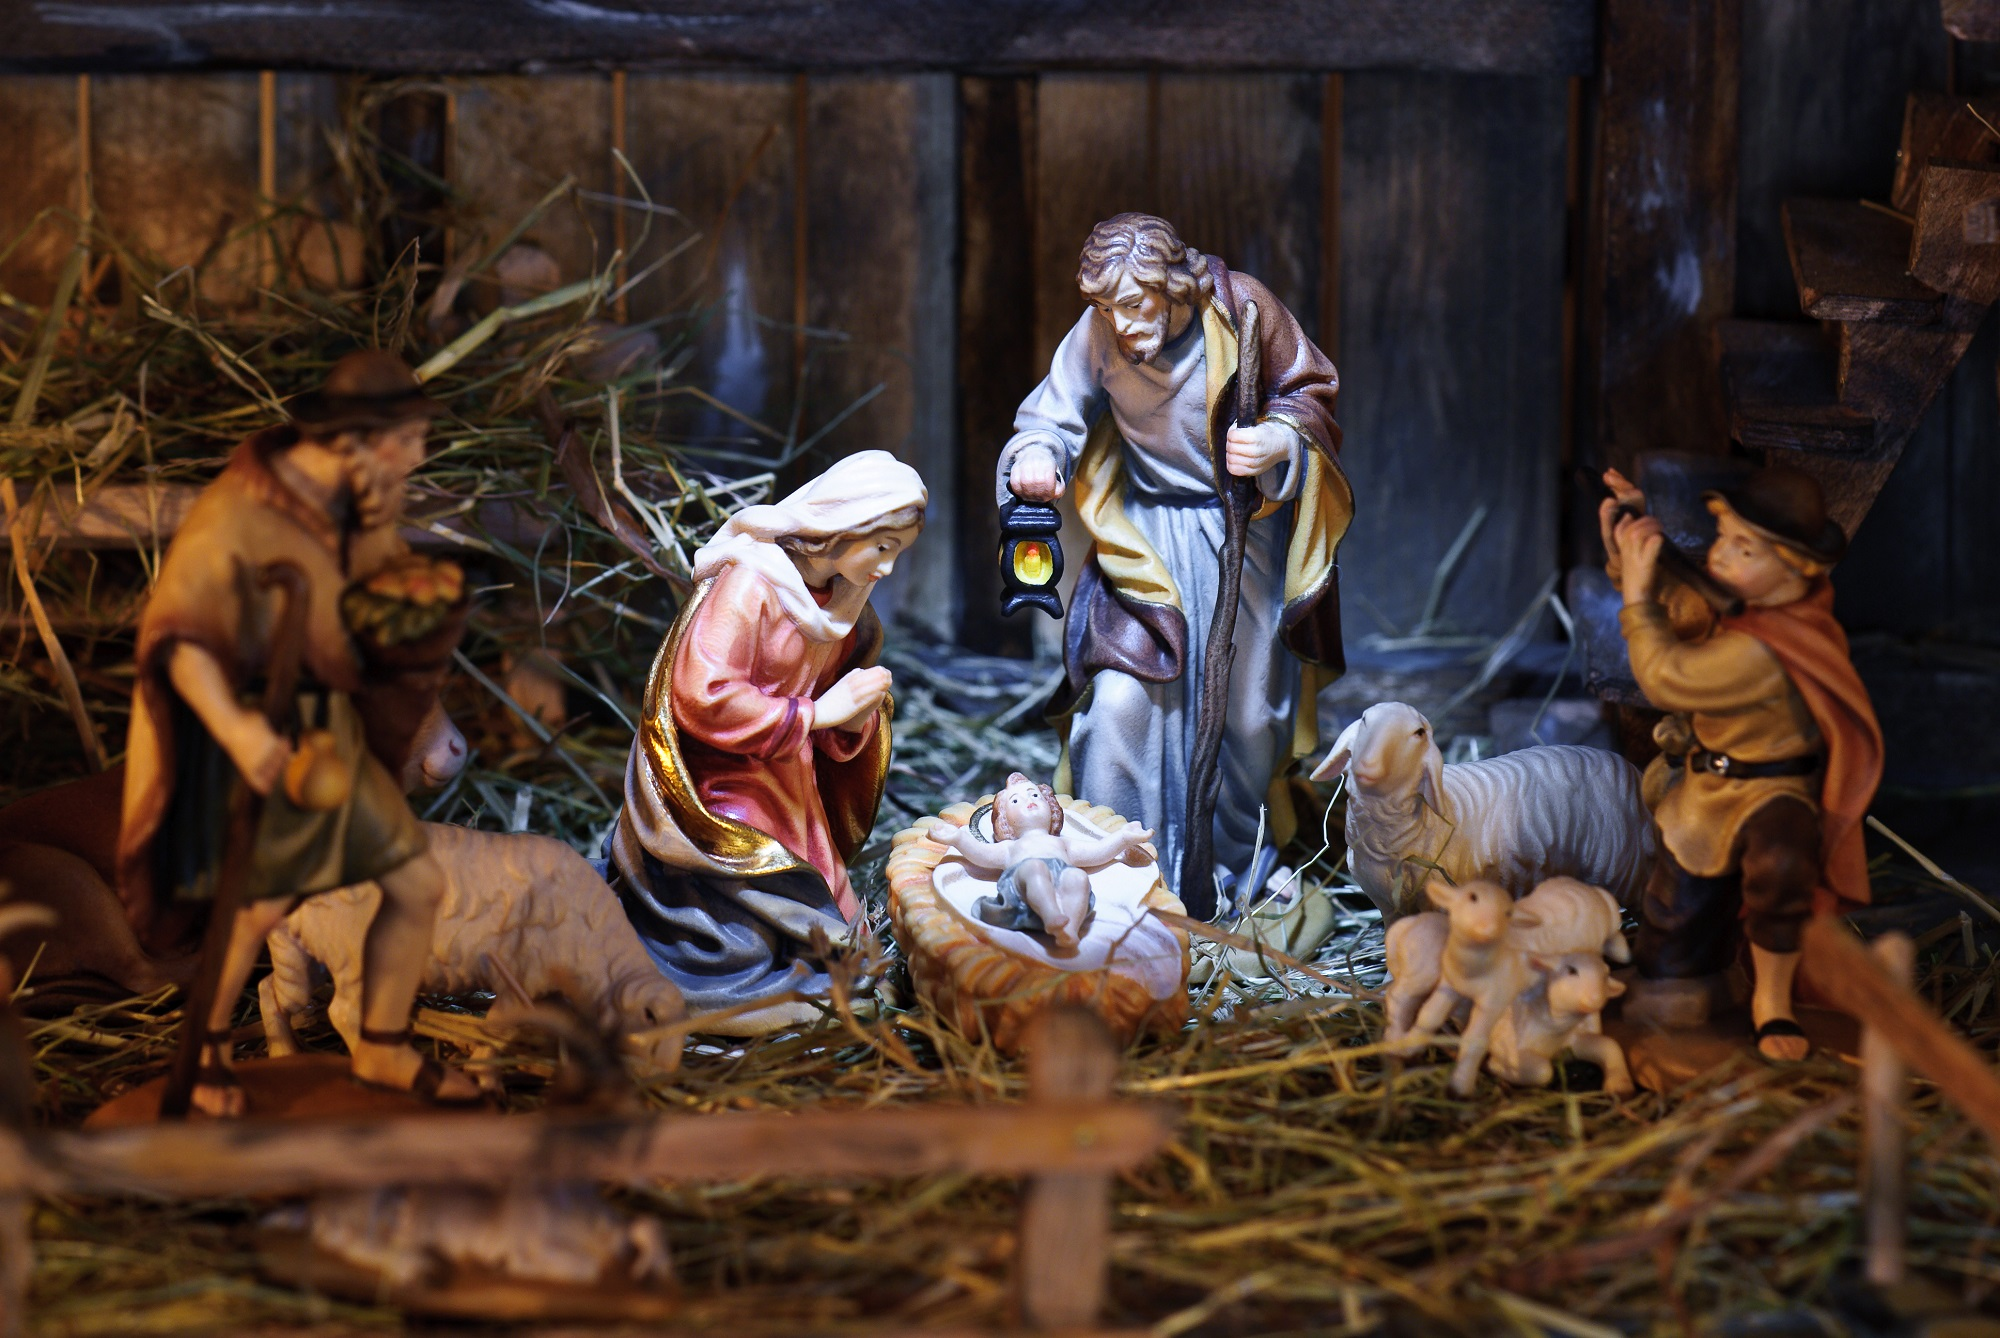 nativity scene Shutterstock/Alexander Hoffmann